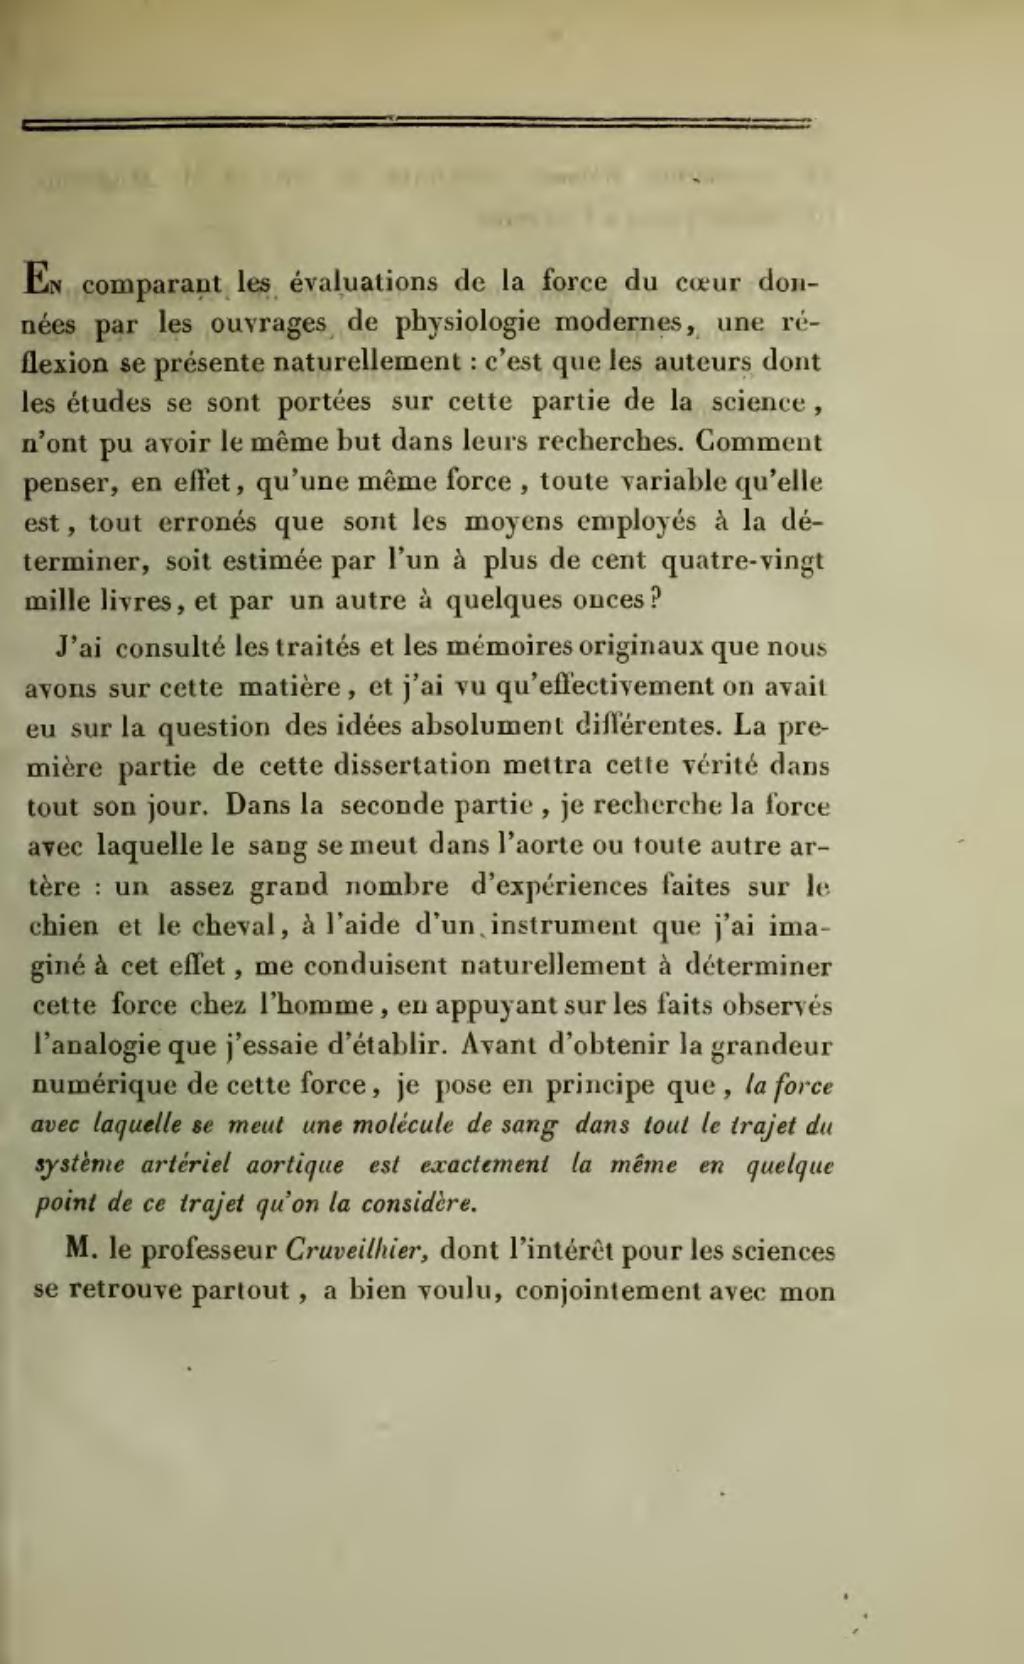 dissertation de laorte